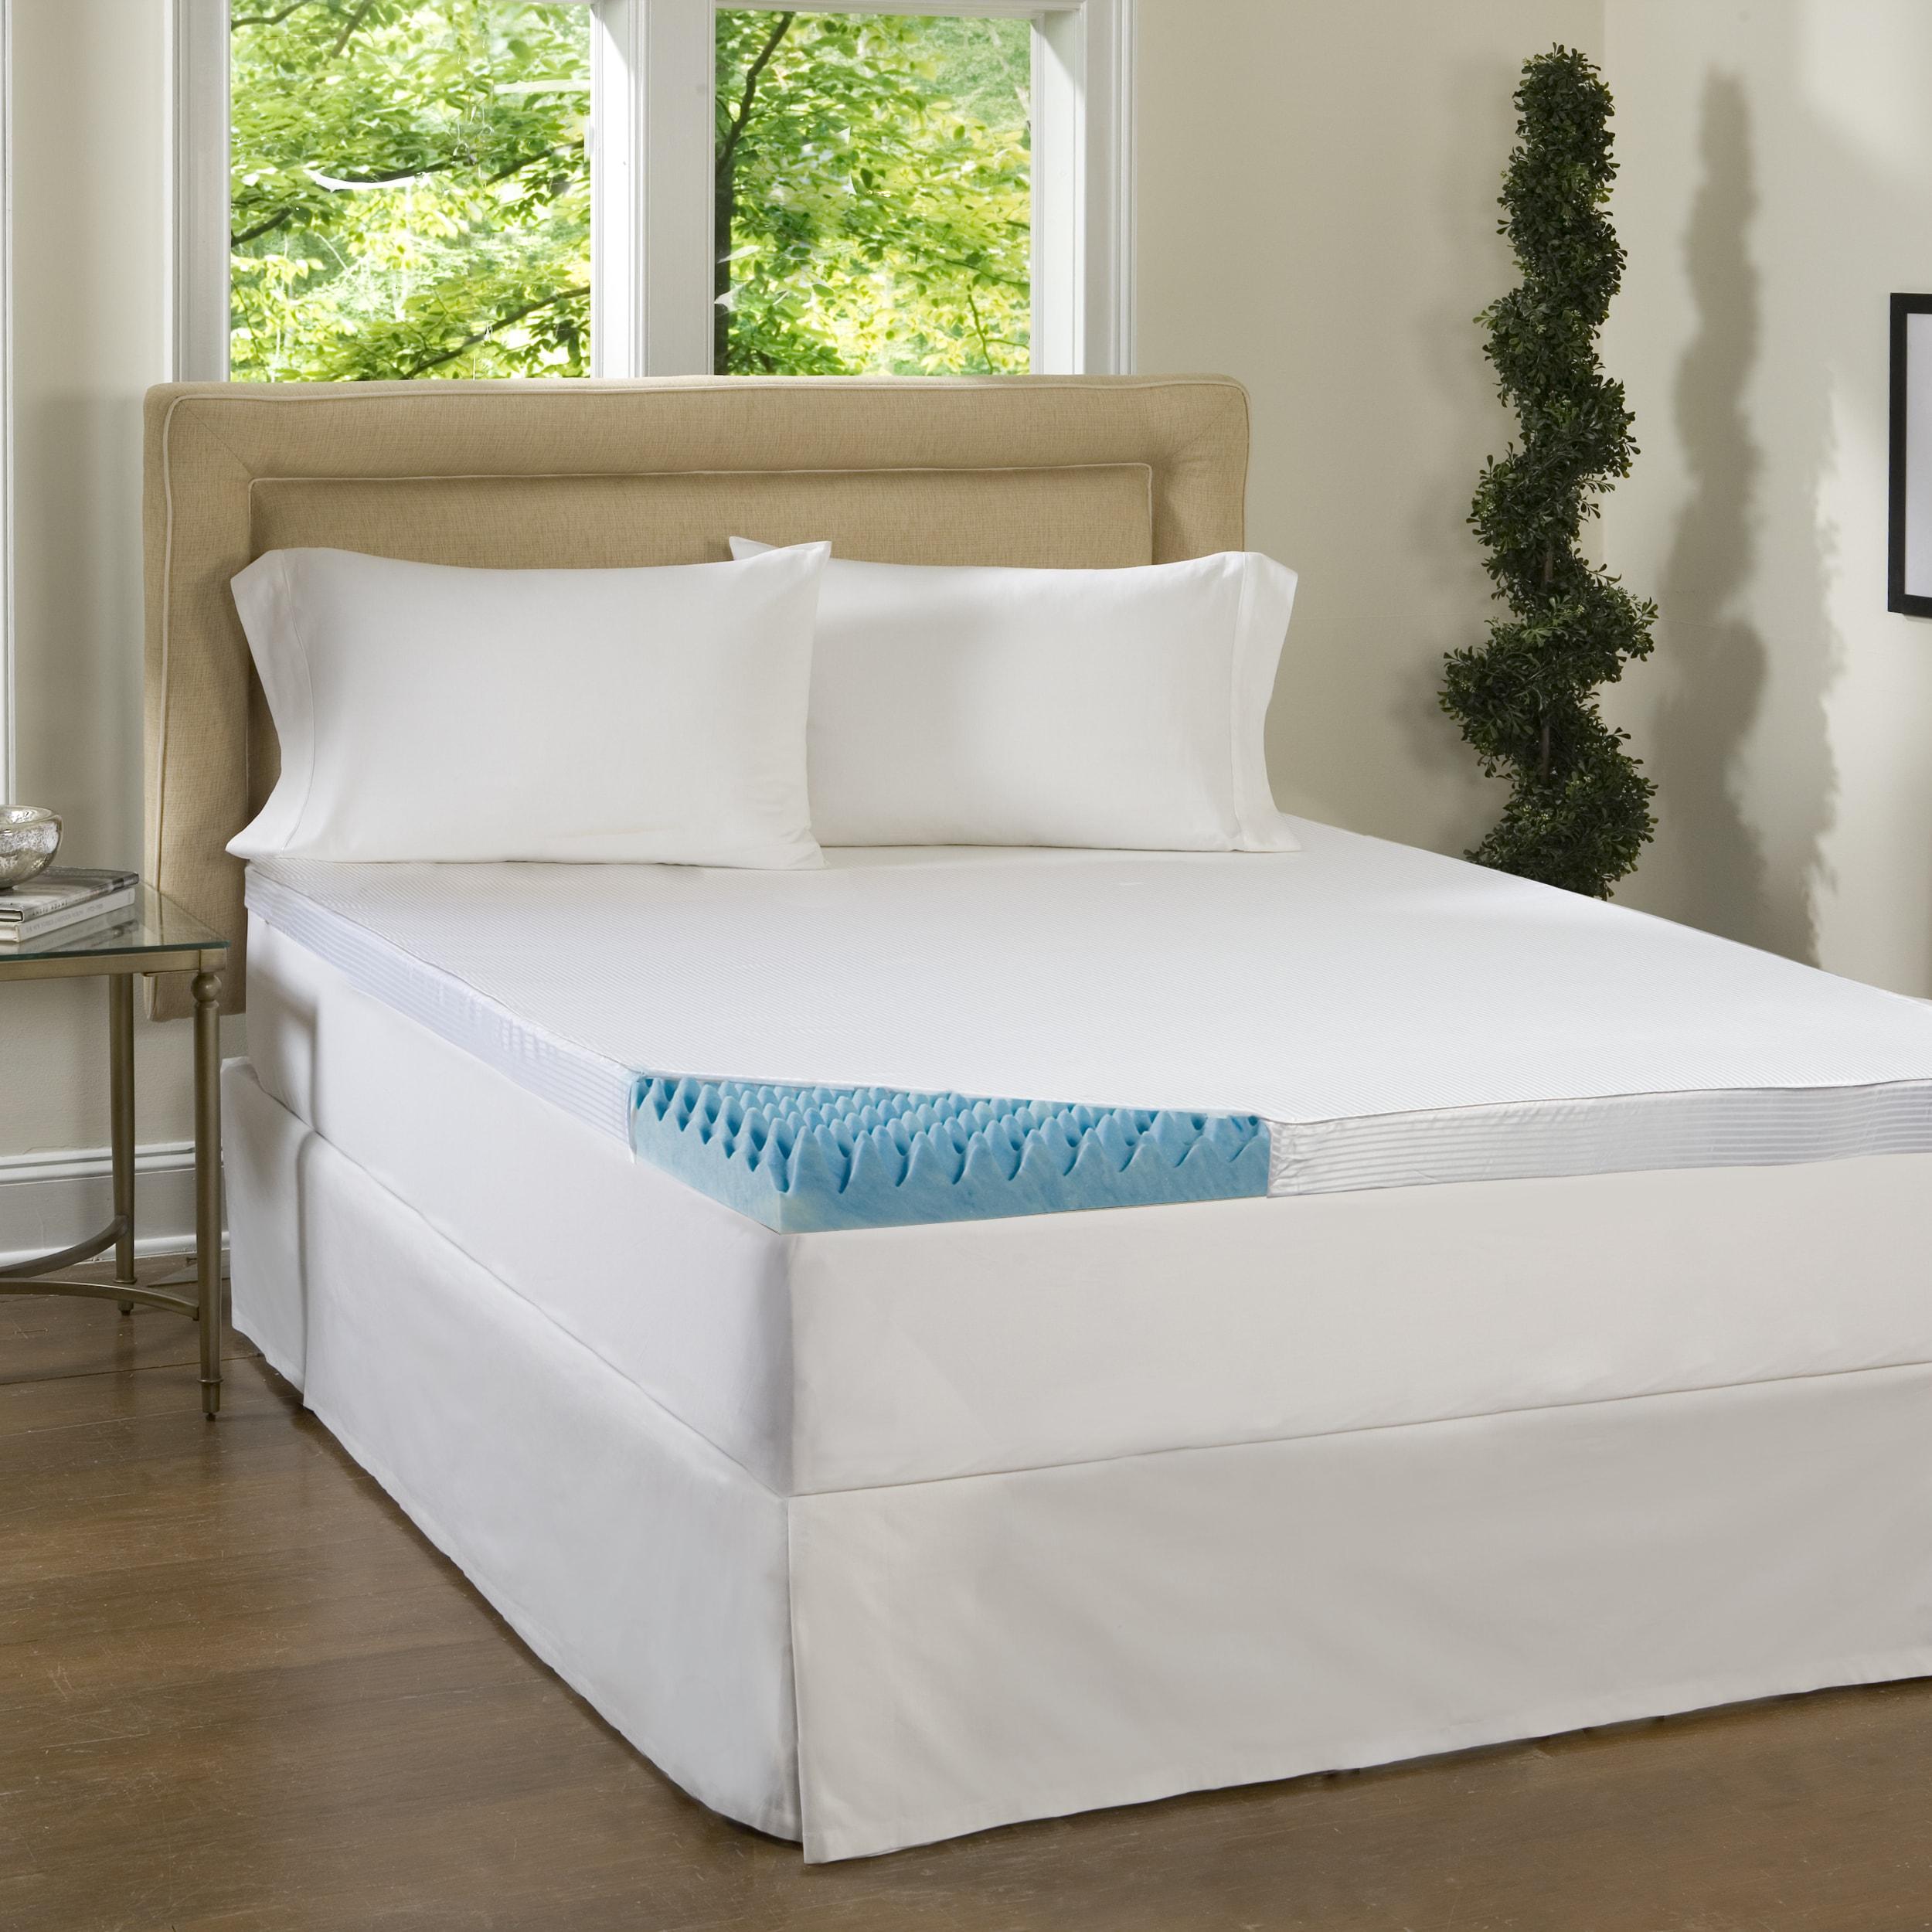 gel topper full detail mattress foam memory relax